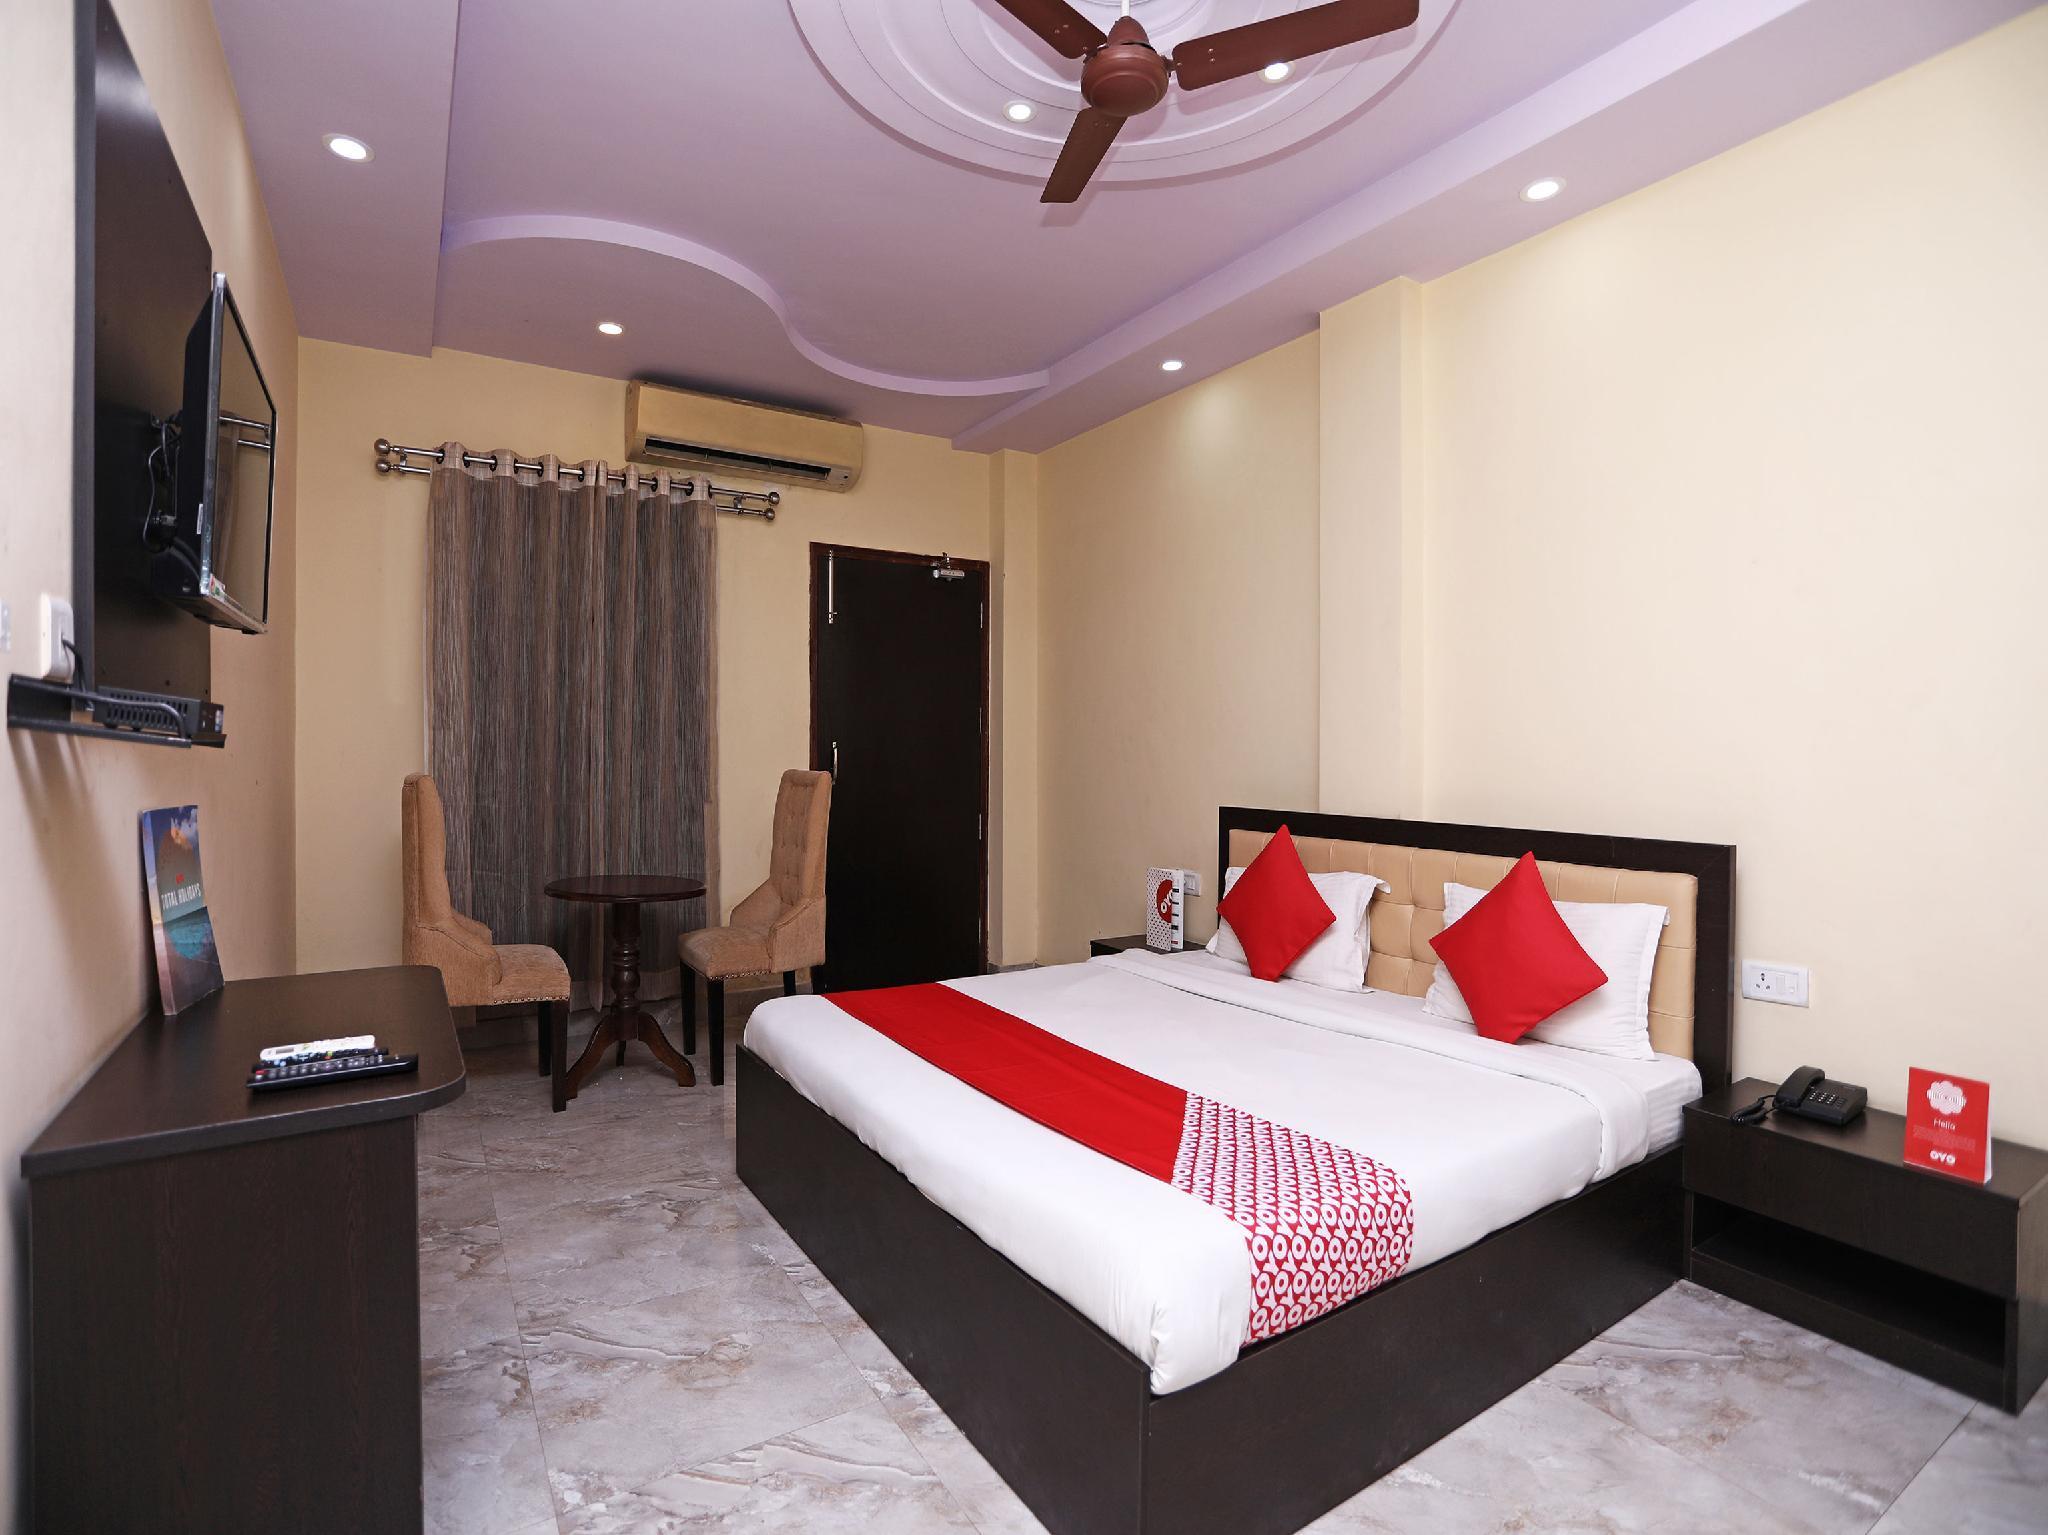 OYO 17408 Scindia Resorts And Hotels